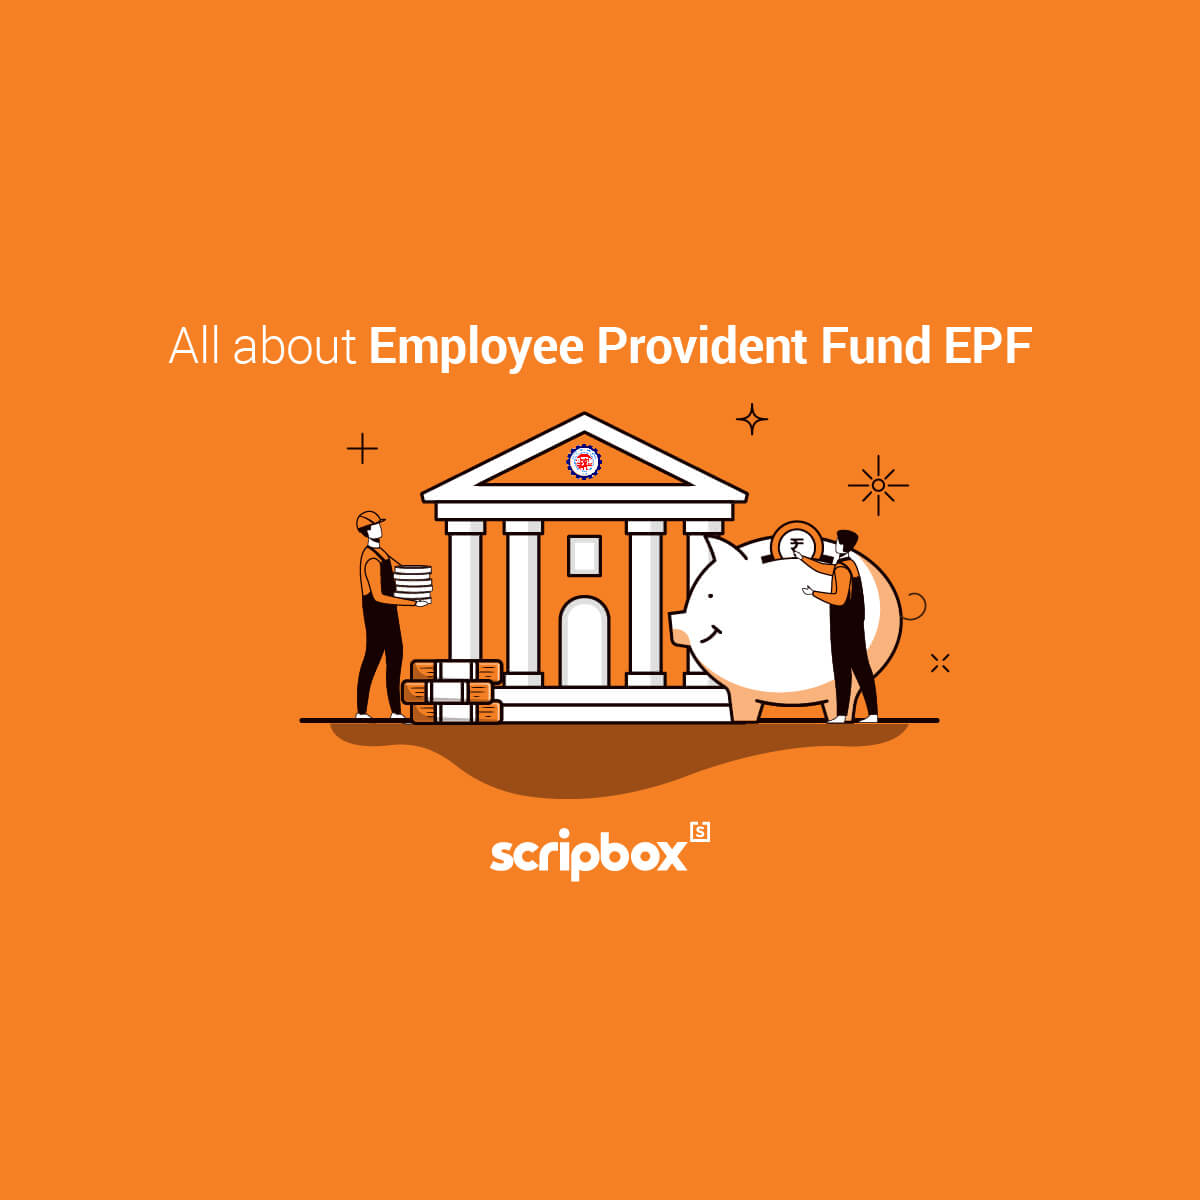 employee provident fund (epf)